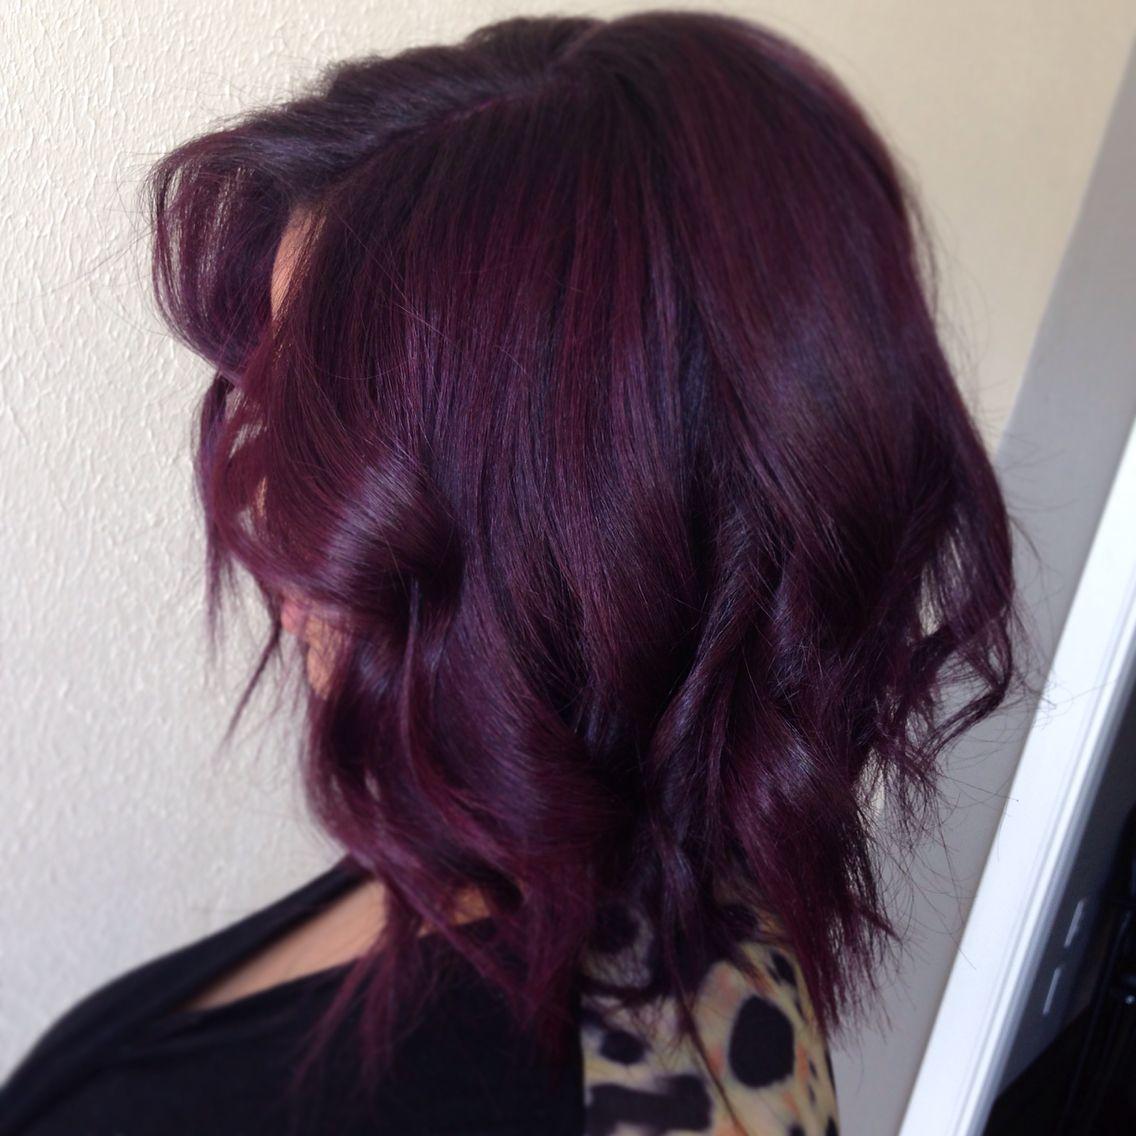 Hair by Kierra Taylor | Dallas, Texas Colorist | www.kierrataylor.com | Deep Plum Lob